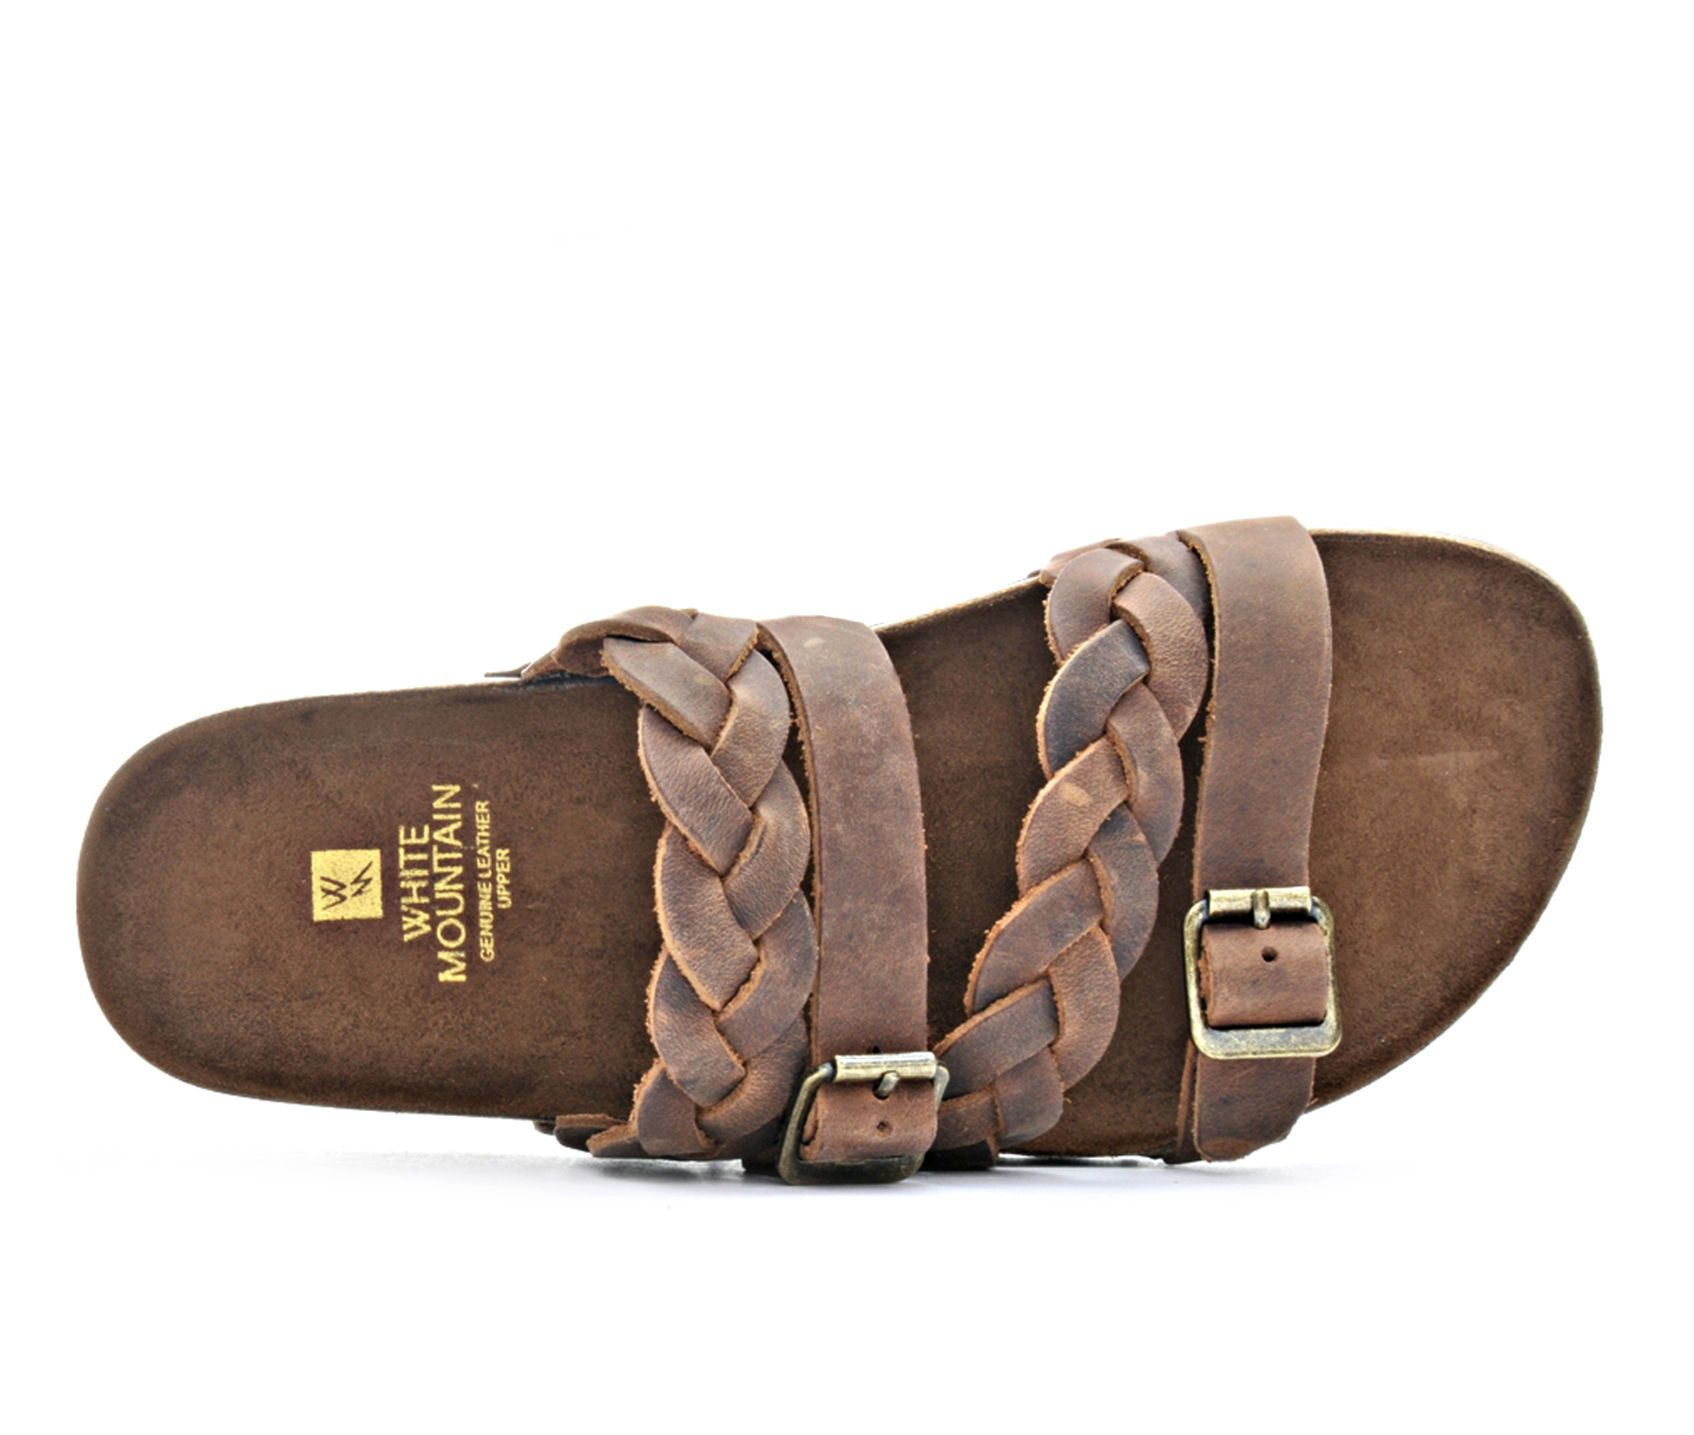 9a05c676de97 Women s White Mountain Holland Footbed Sandals